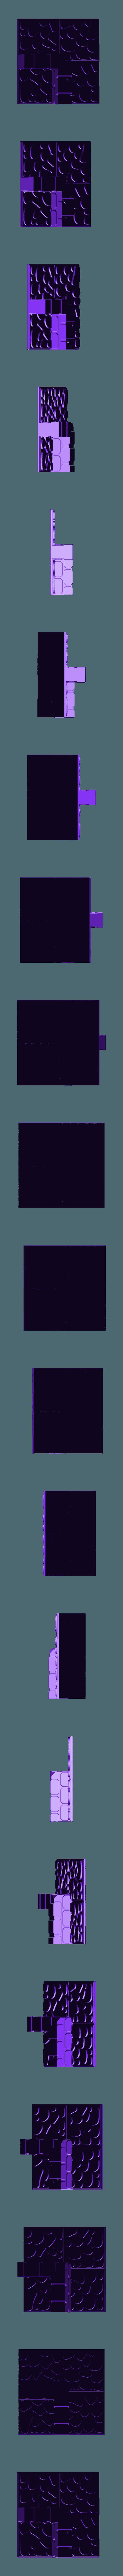 Finalized_Wall_L.stl Download STL file GeneriTiles - Tabletop RPG Tileset • 3D printable object, daandruff